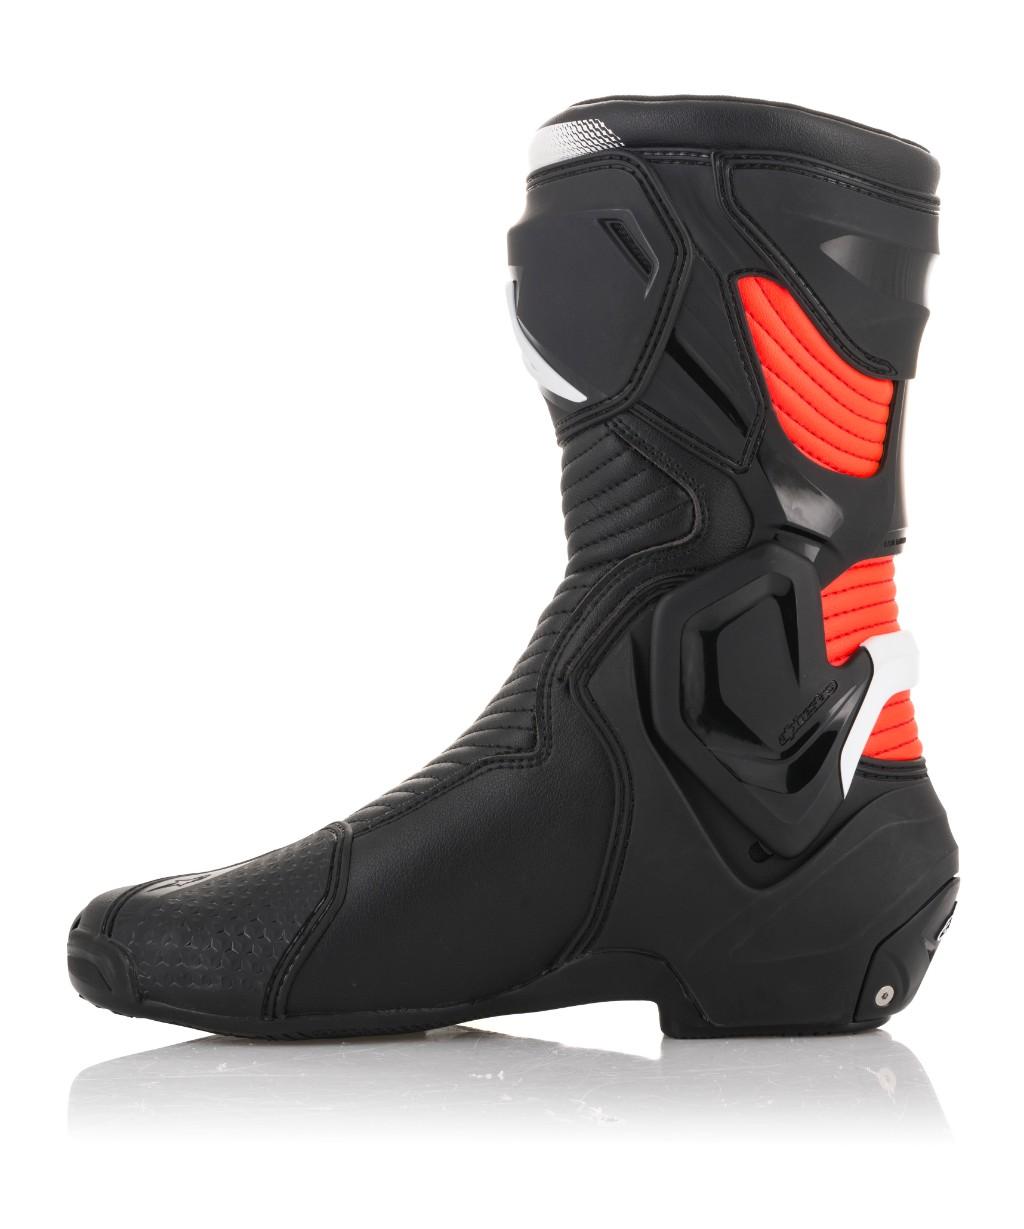 Alpinestars Botas de moto Smx Plus V2 Boots Black 36